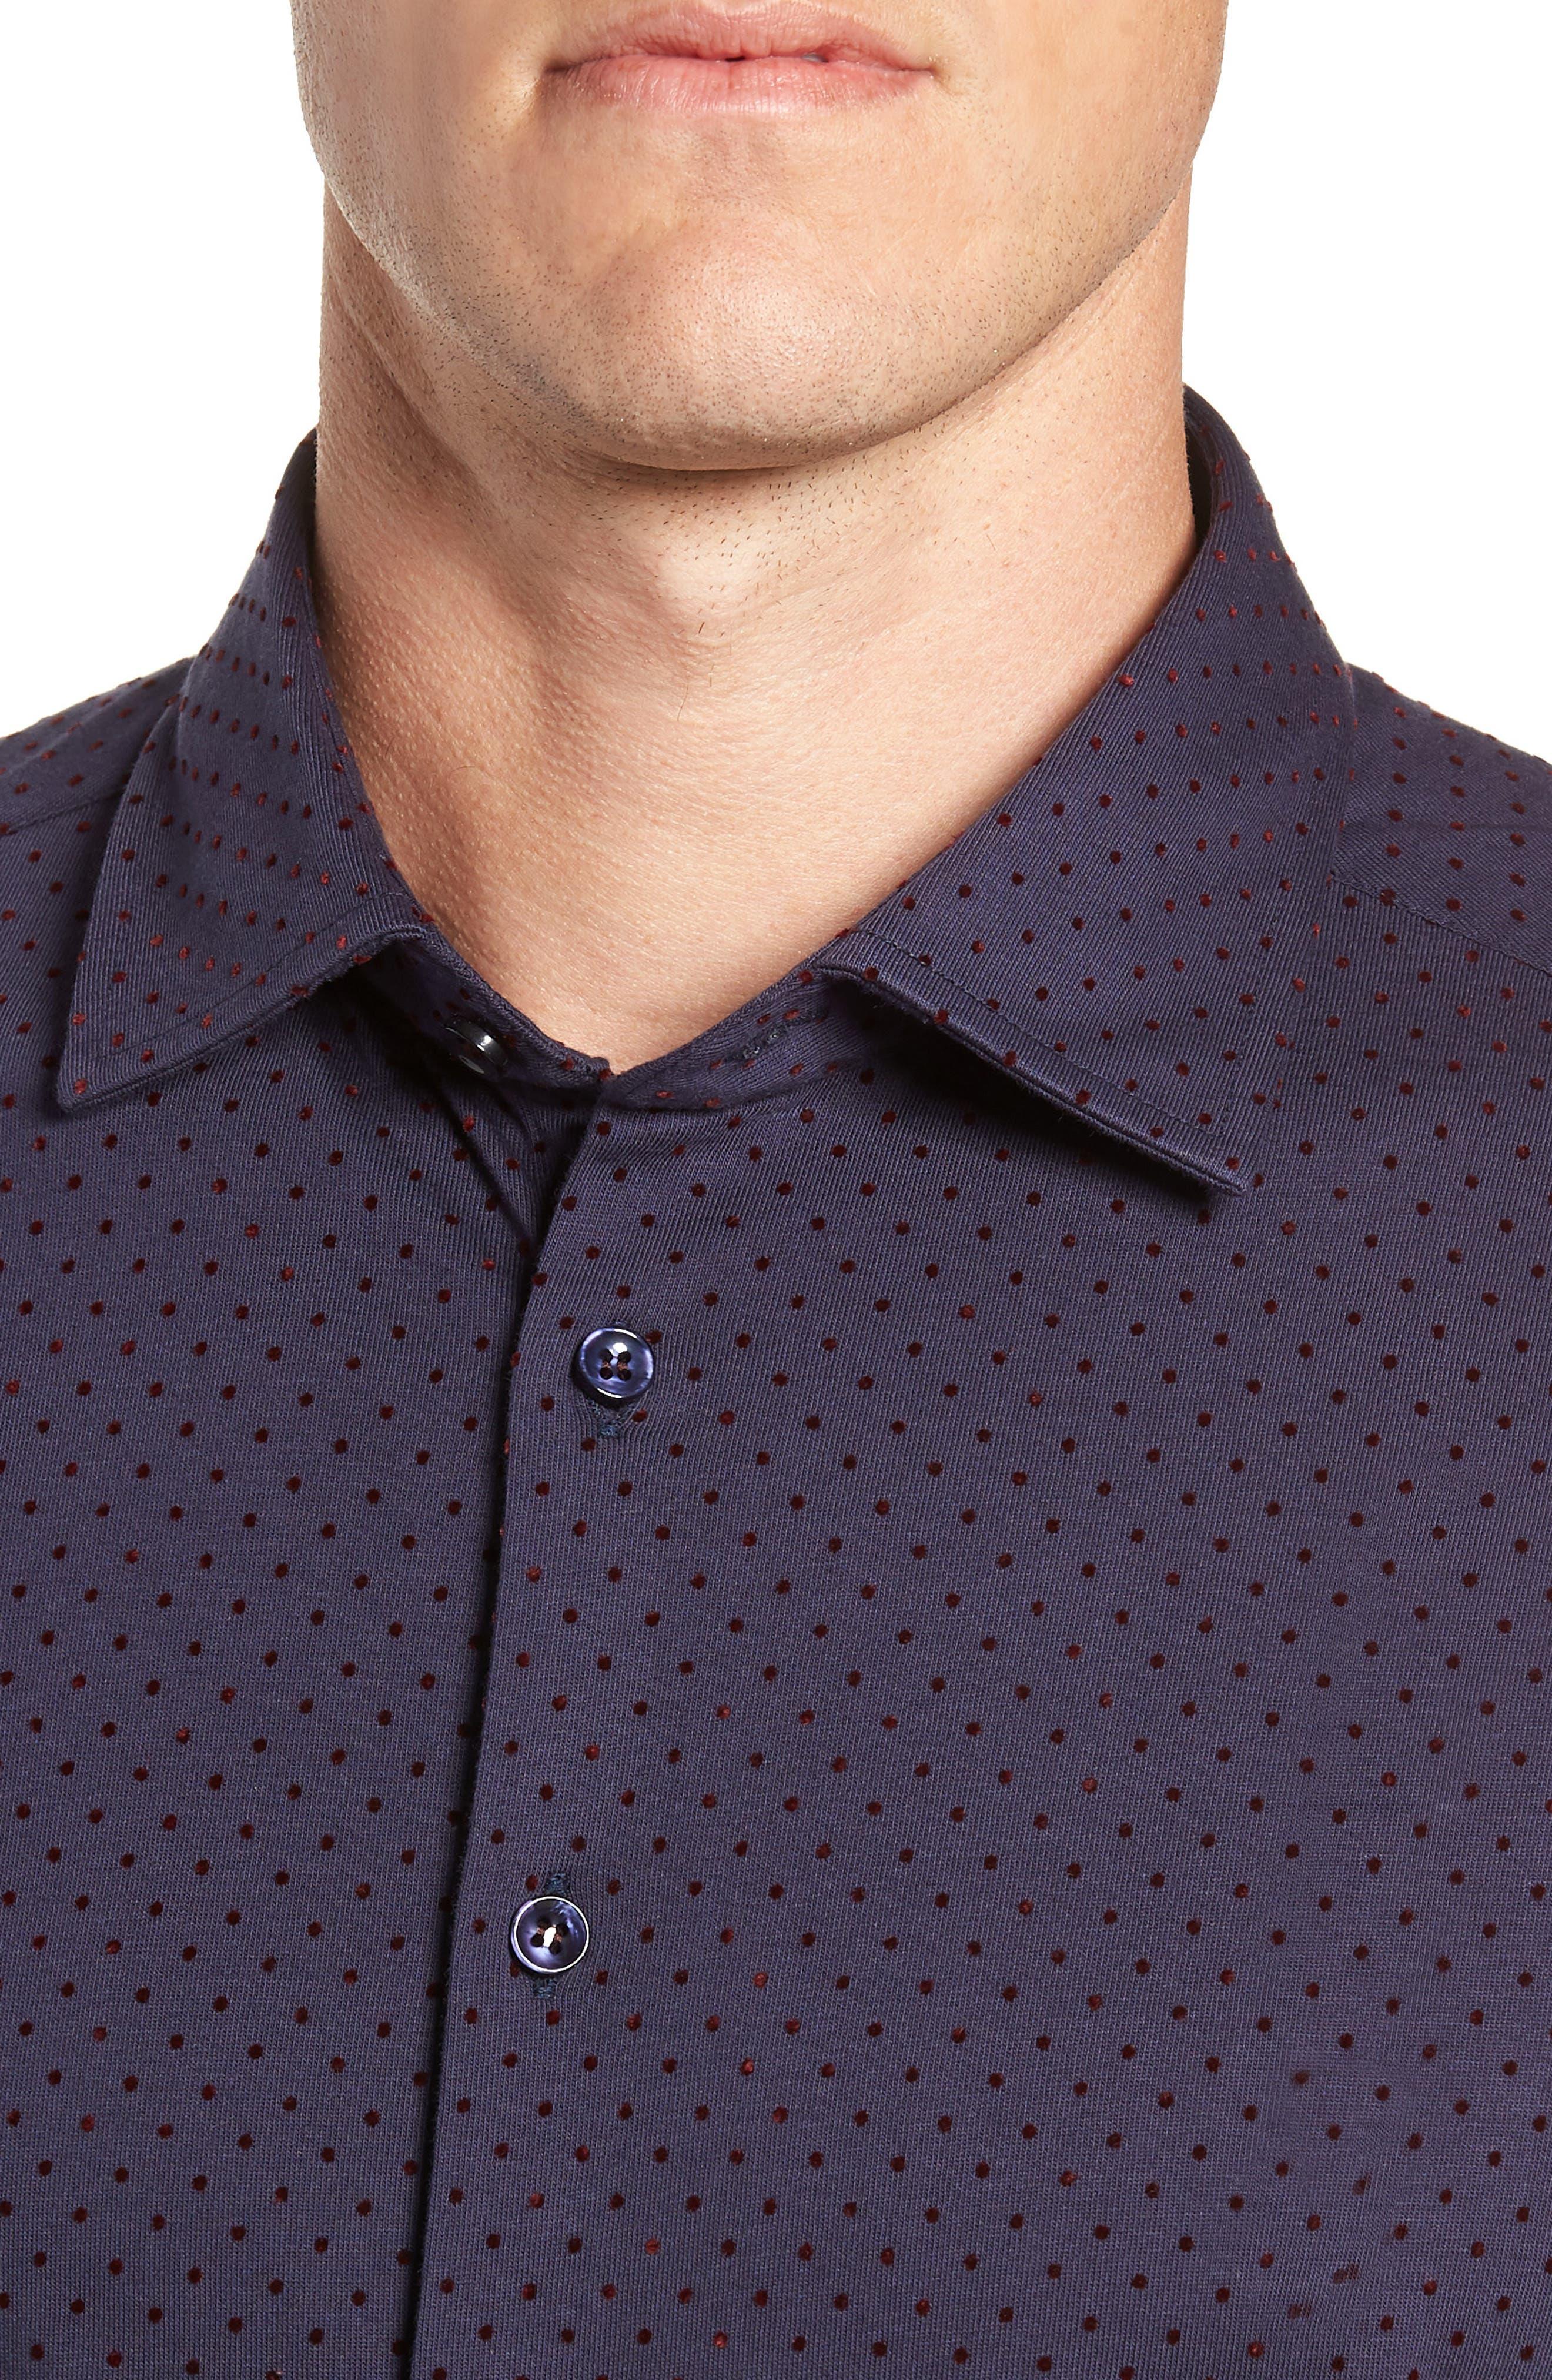 STONE ROSE,                             Regular Fit Knit Sport Shirt,                             Alternate thumbnail 2, color,                             NAVY